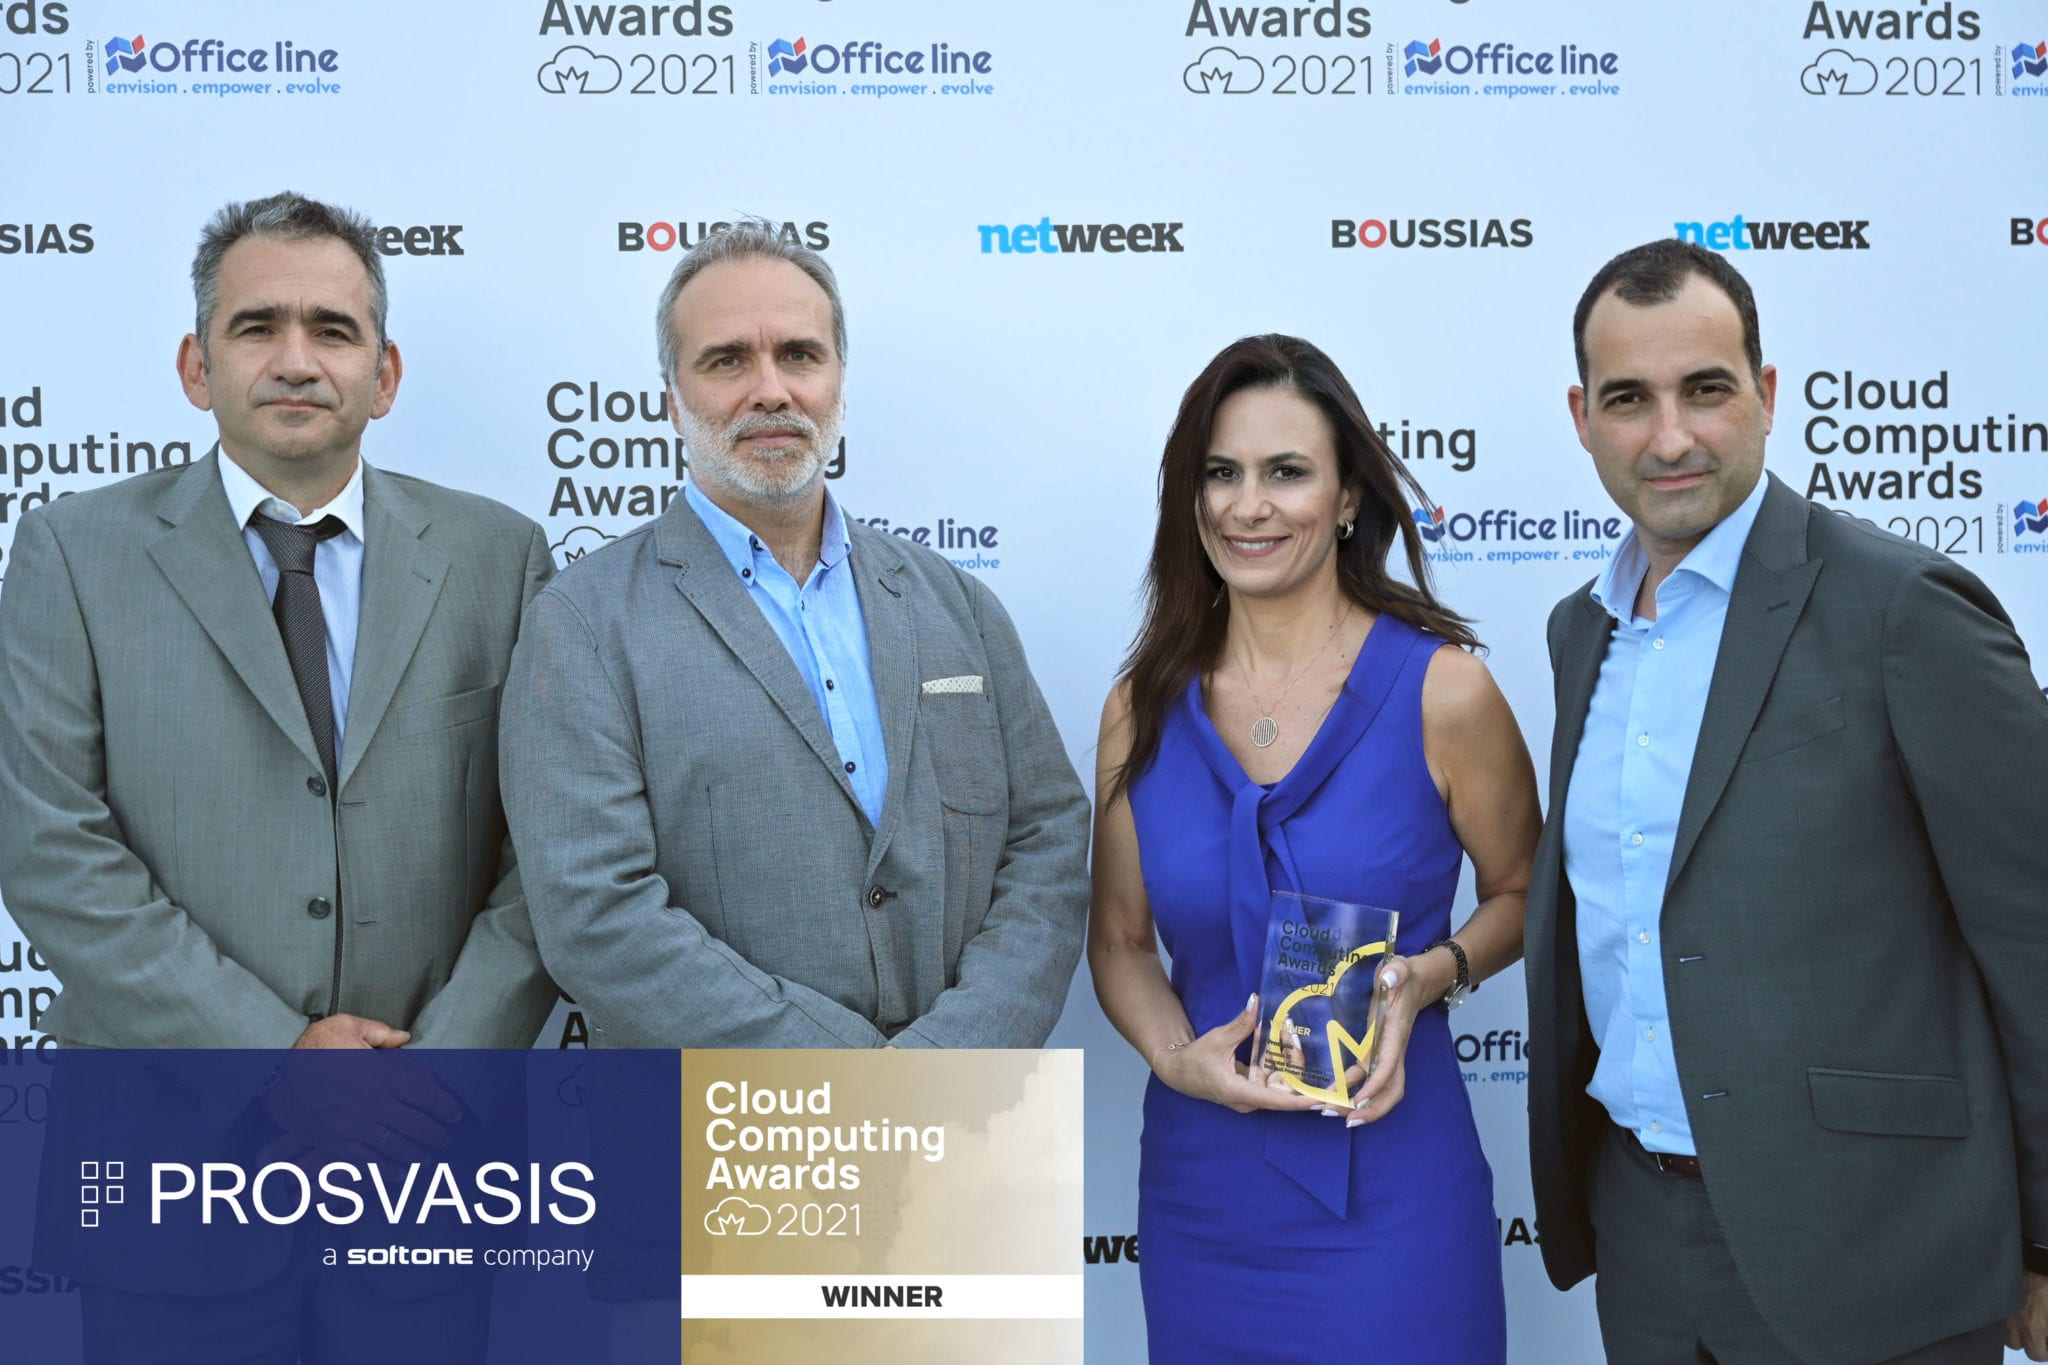 CloudAwards21 Winner Prosvasis